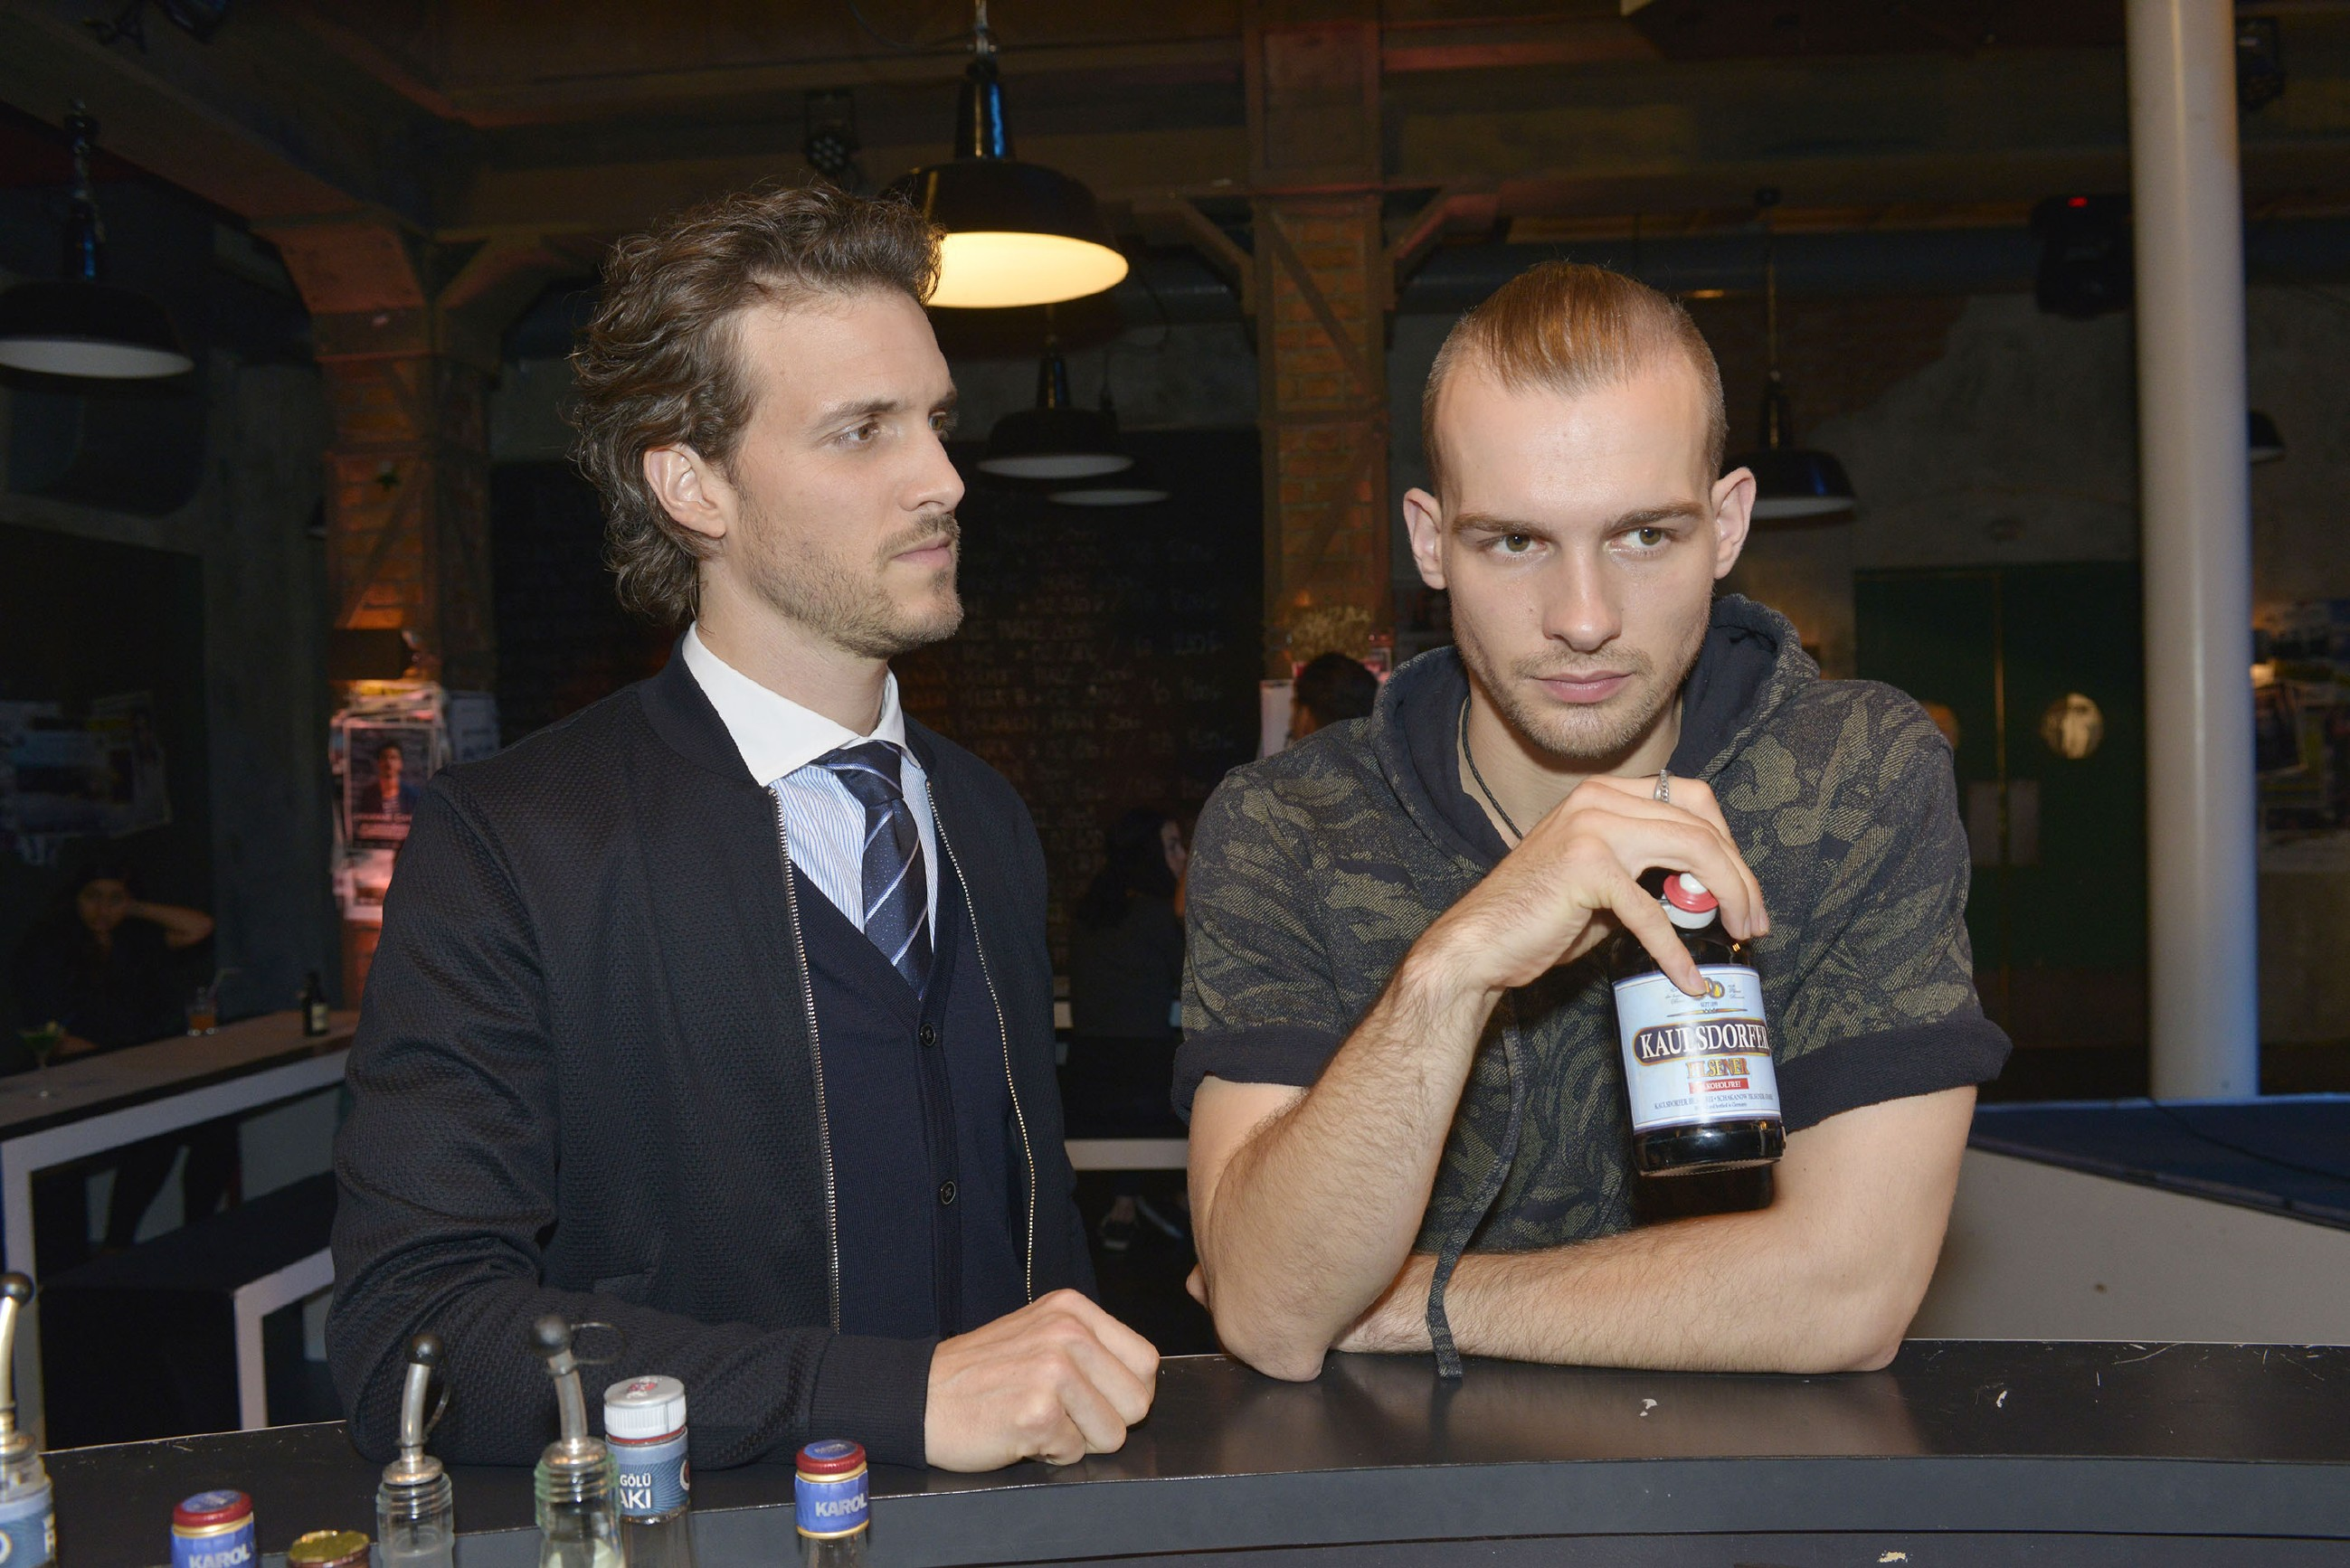 Chris (Eric Stehfest, r.) muss sich nach Felix' (Thaddäus Meilinger) Ansage fragen, ob er Rosa zu Unrecht Vorwürfe gemacht hat.